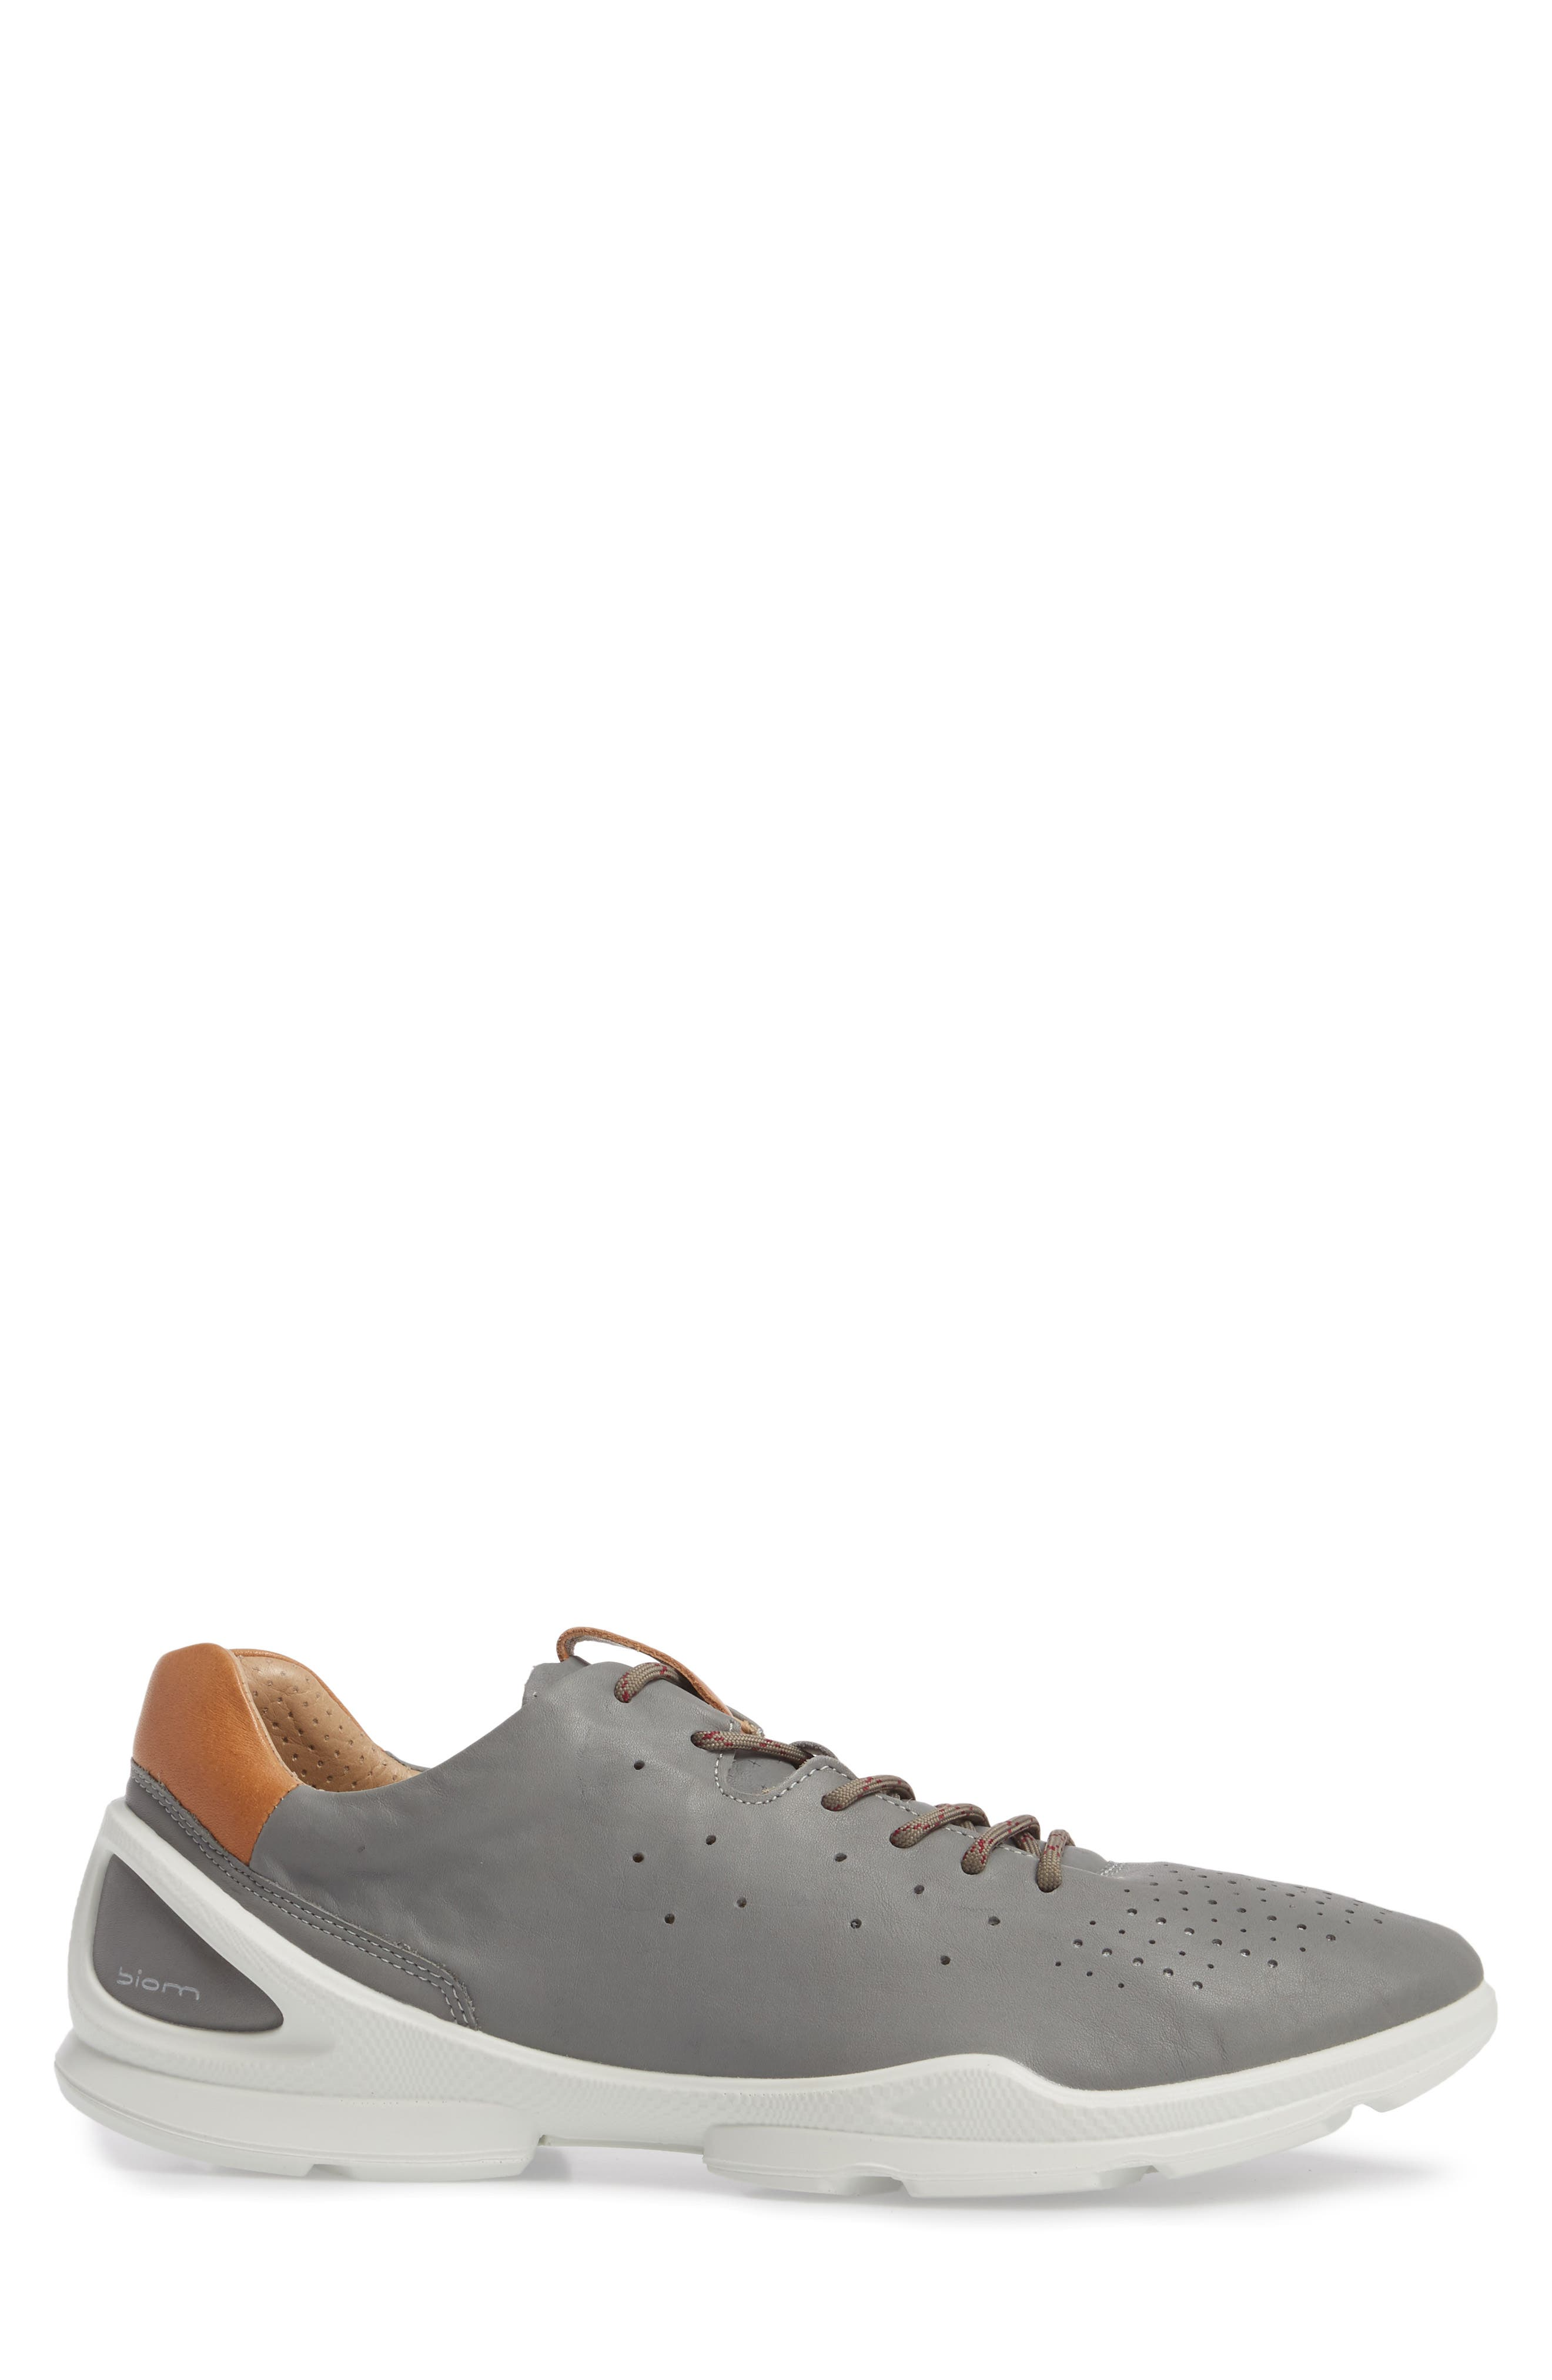 Biom Street Sneaker,                             Alternate thumbnail 3, color,                             Wild Dove Leather